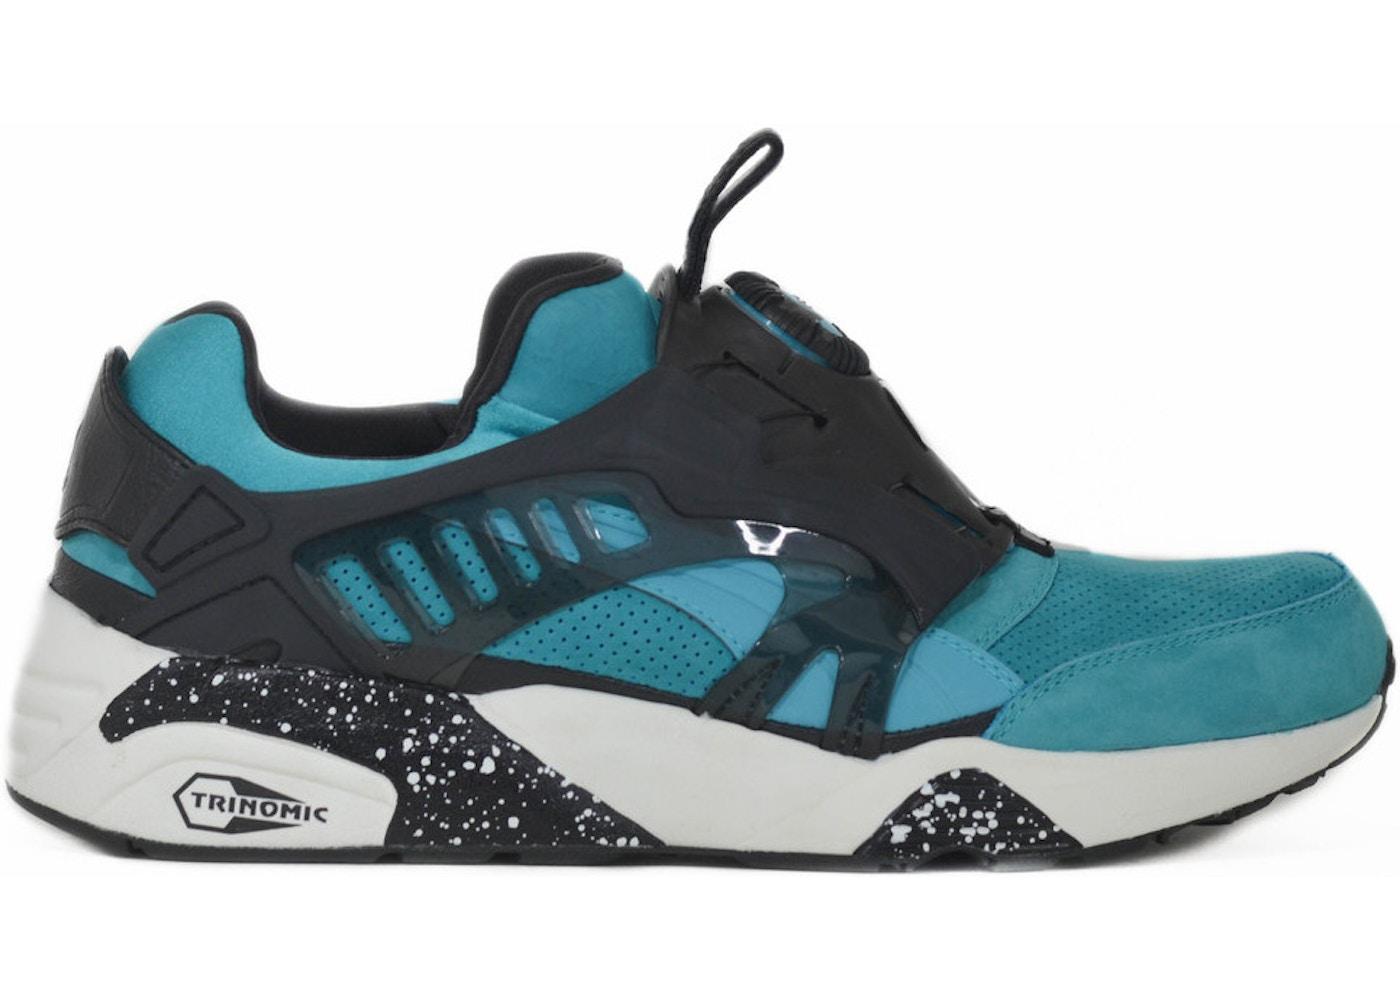 sneakers for cheap 1e519 537d6 Puma Disc Blaze OG Ronnie Fieg